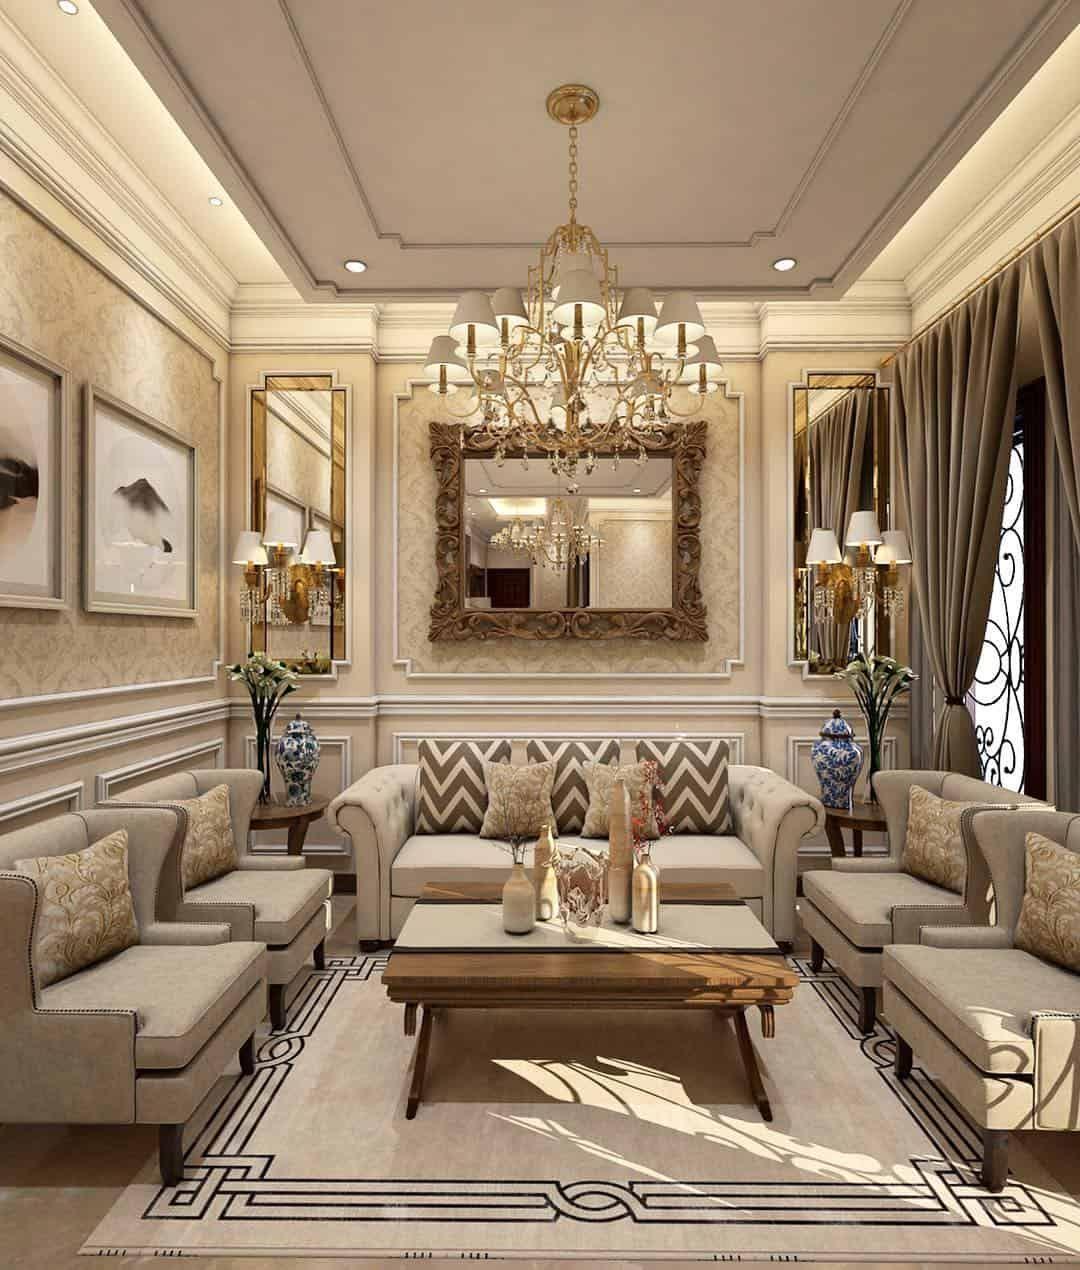 Interior Design Trends 2021 15 Tips For Ultra Harmonic Decor Room Color Design Interior Design Classic Luxury Living Room Living room trends 2021